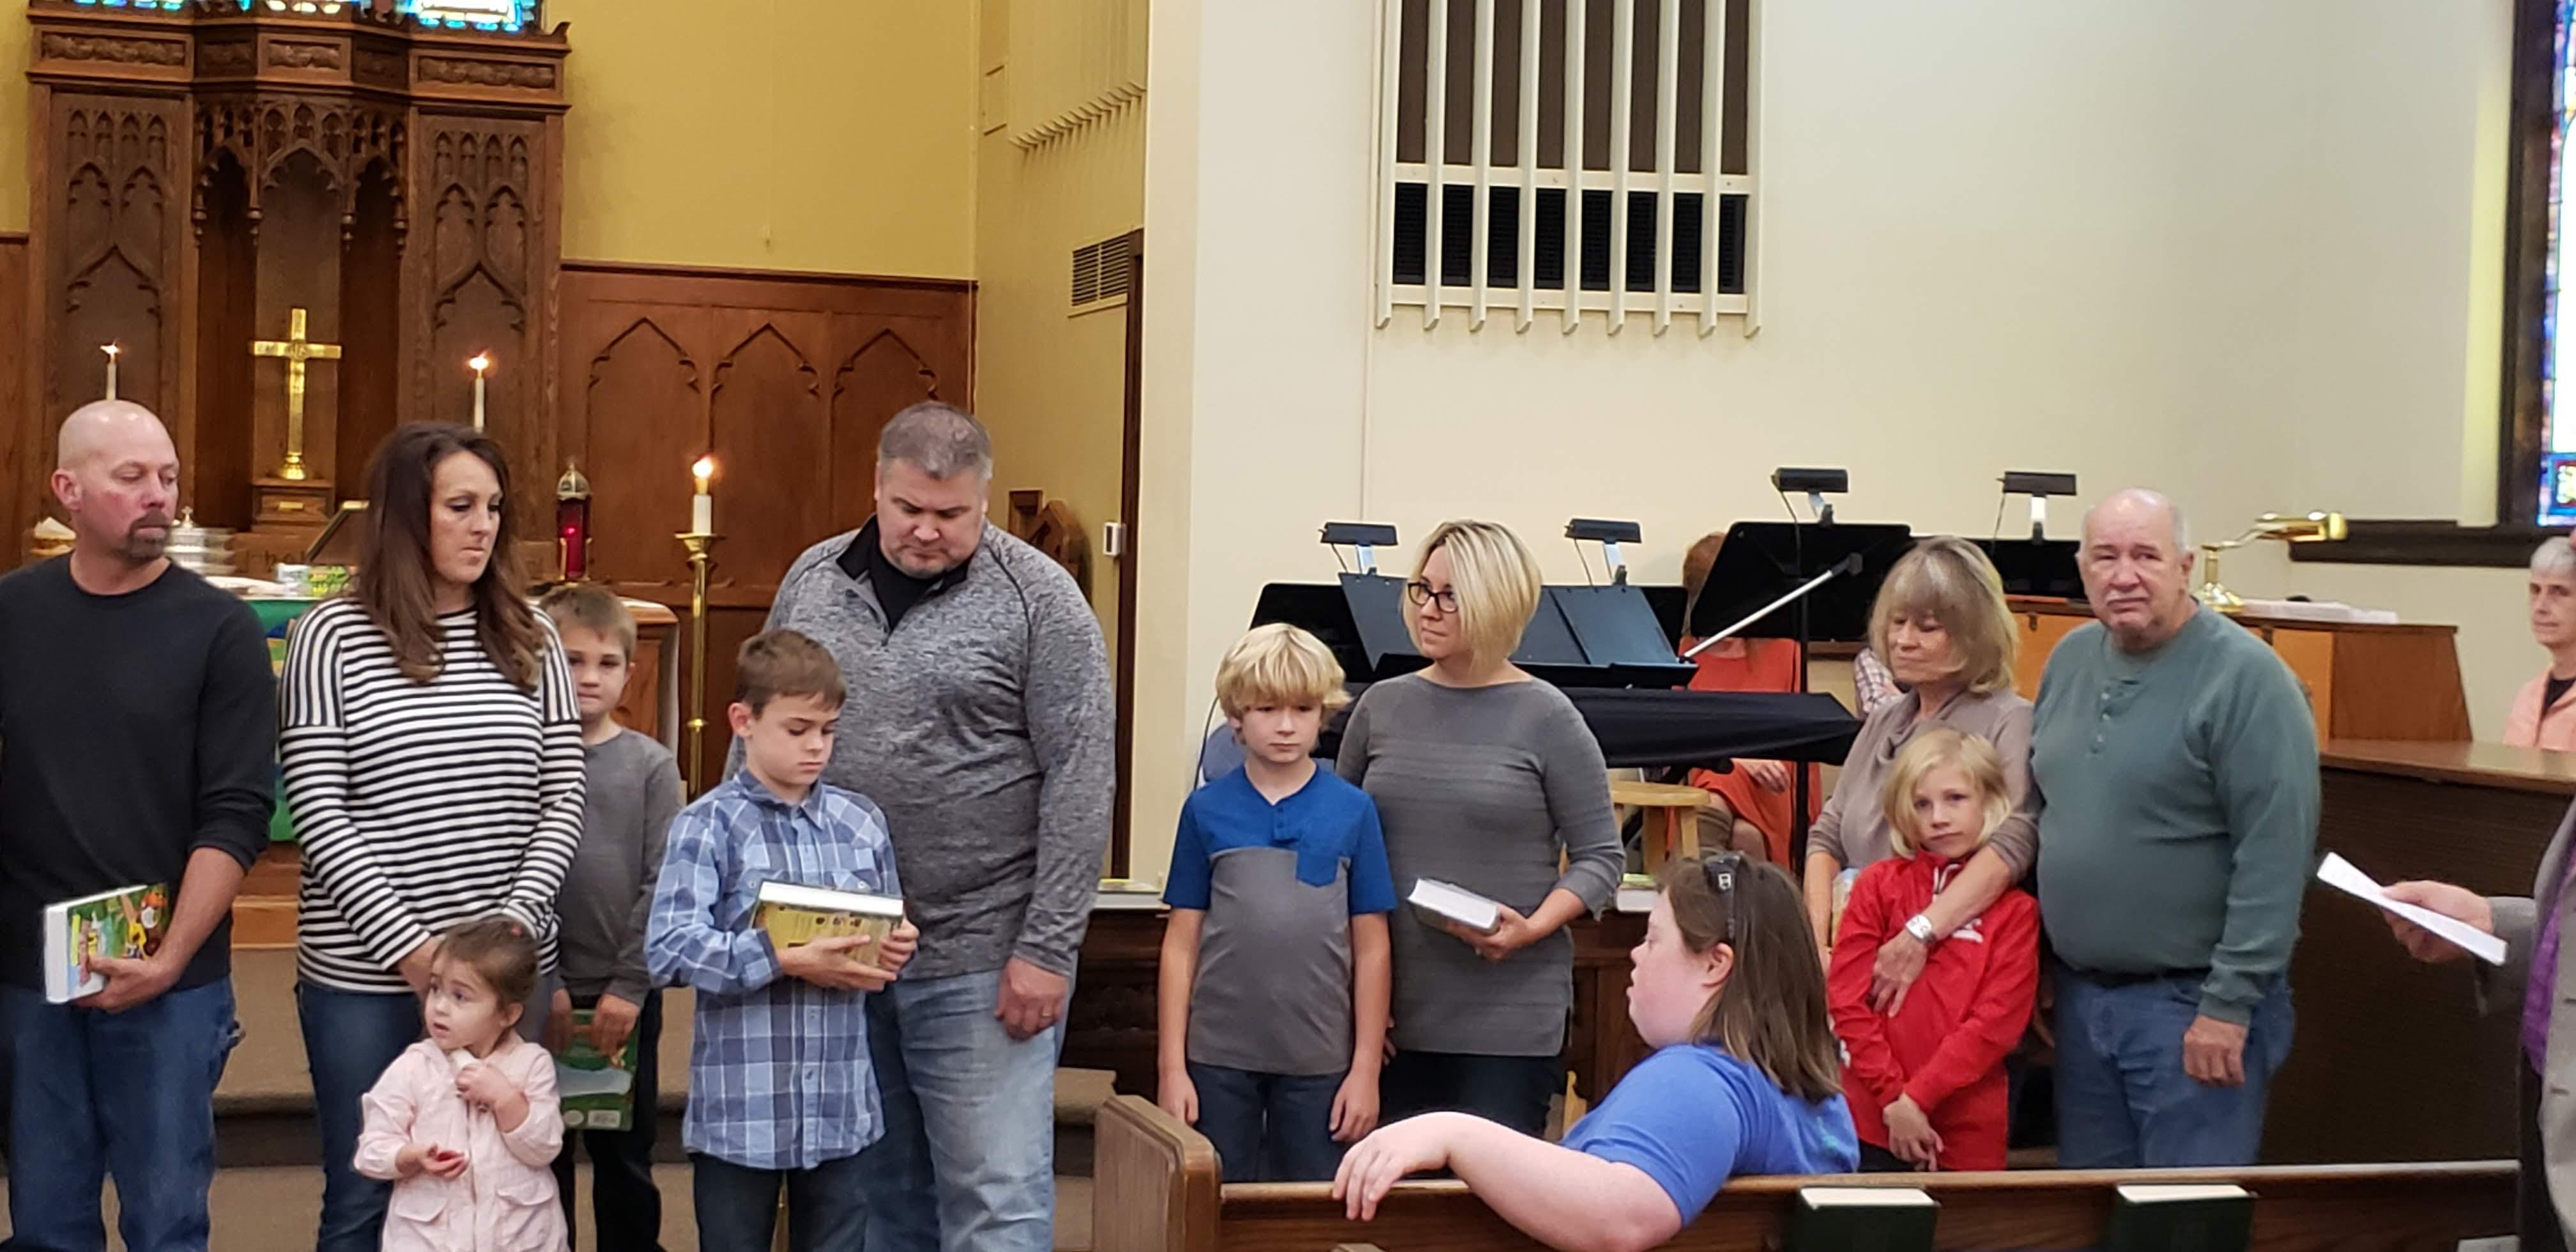 Children's Bible presentation oct 2019 3